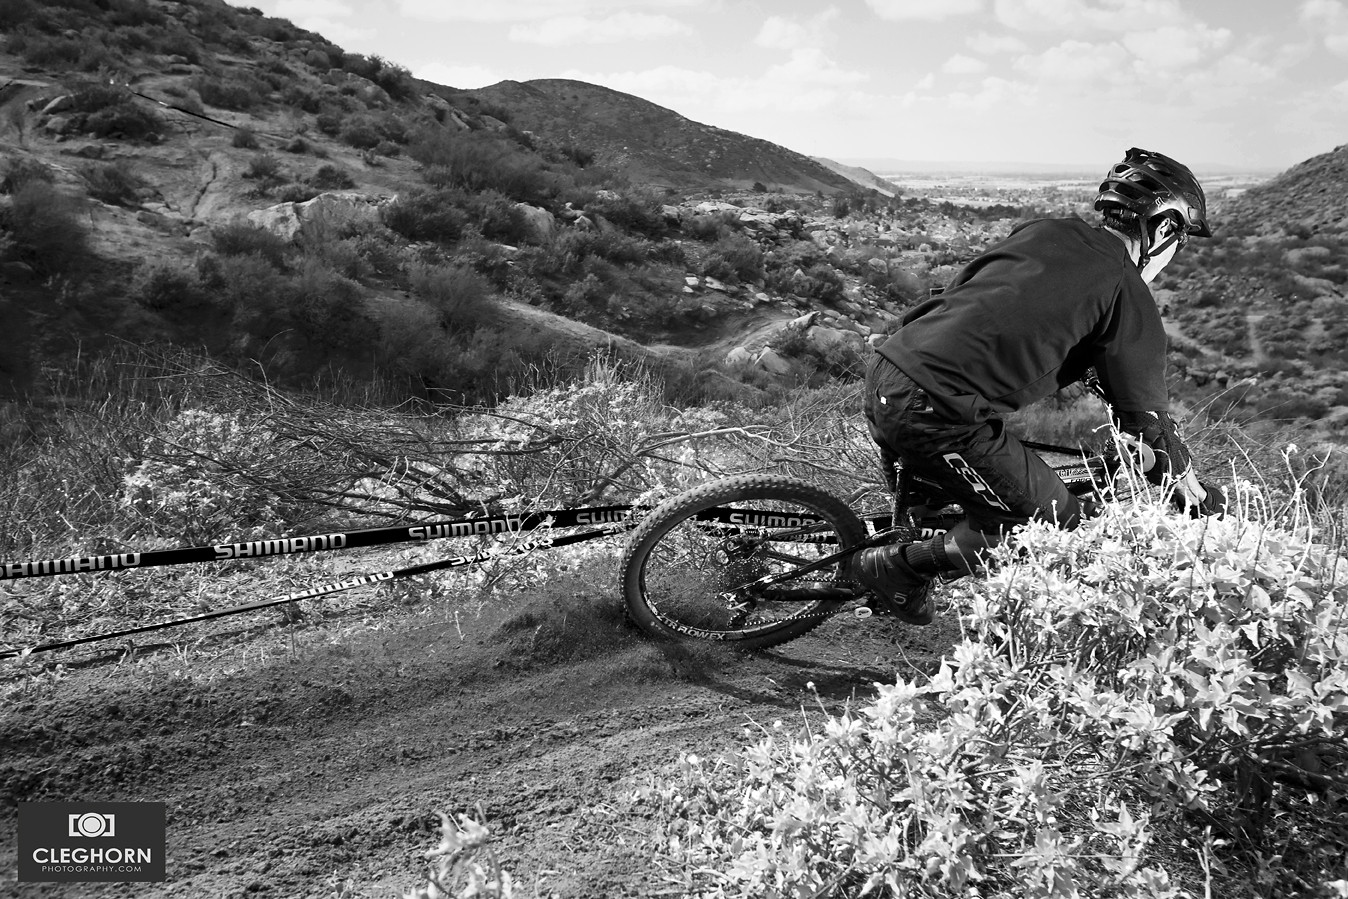 Gilbert Flores - Cleghorn Photography - Mountain Biking Pictures - Vital MTB